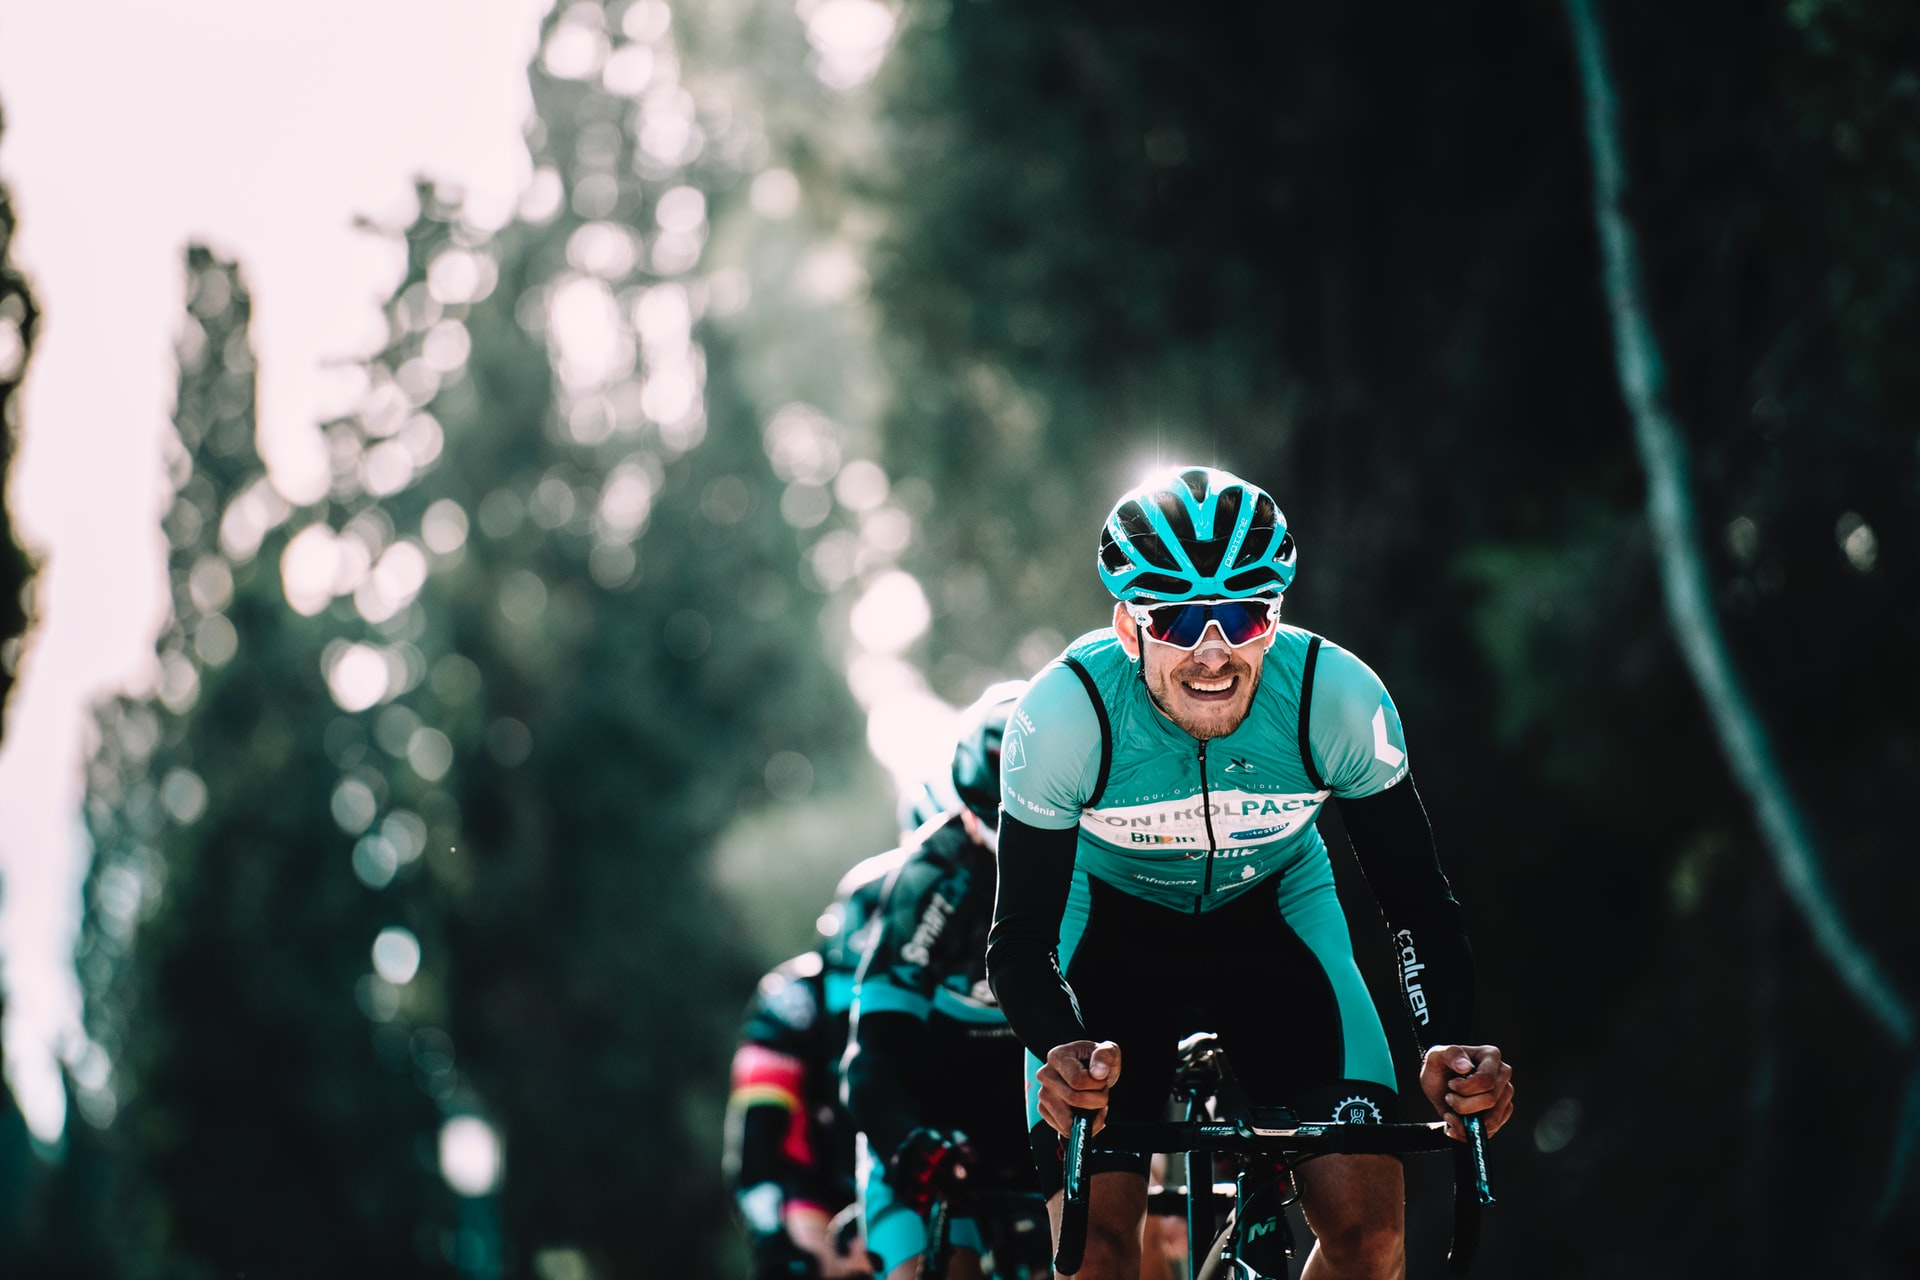 ciclista, gafas